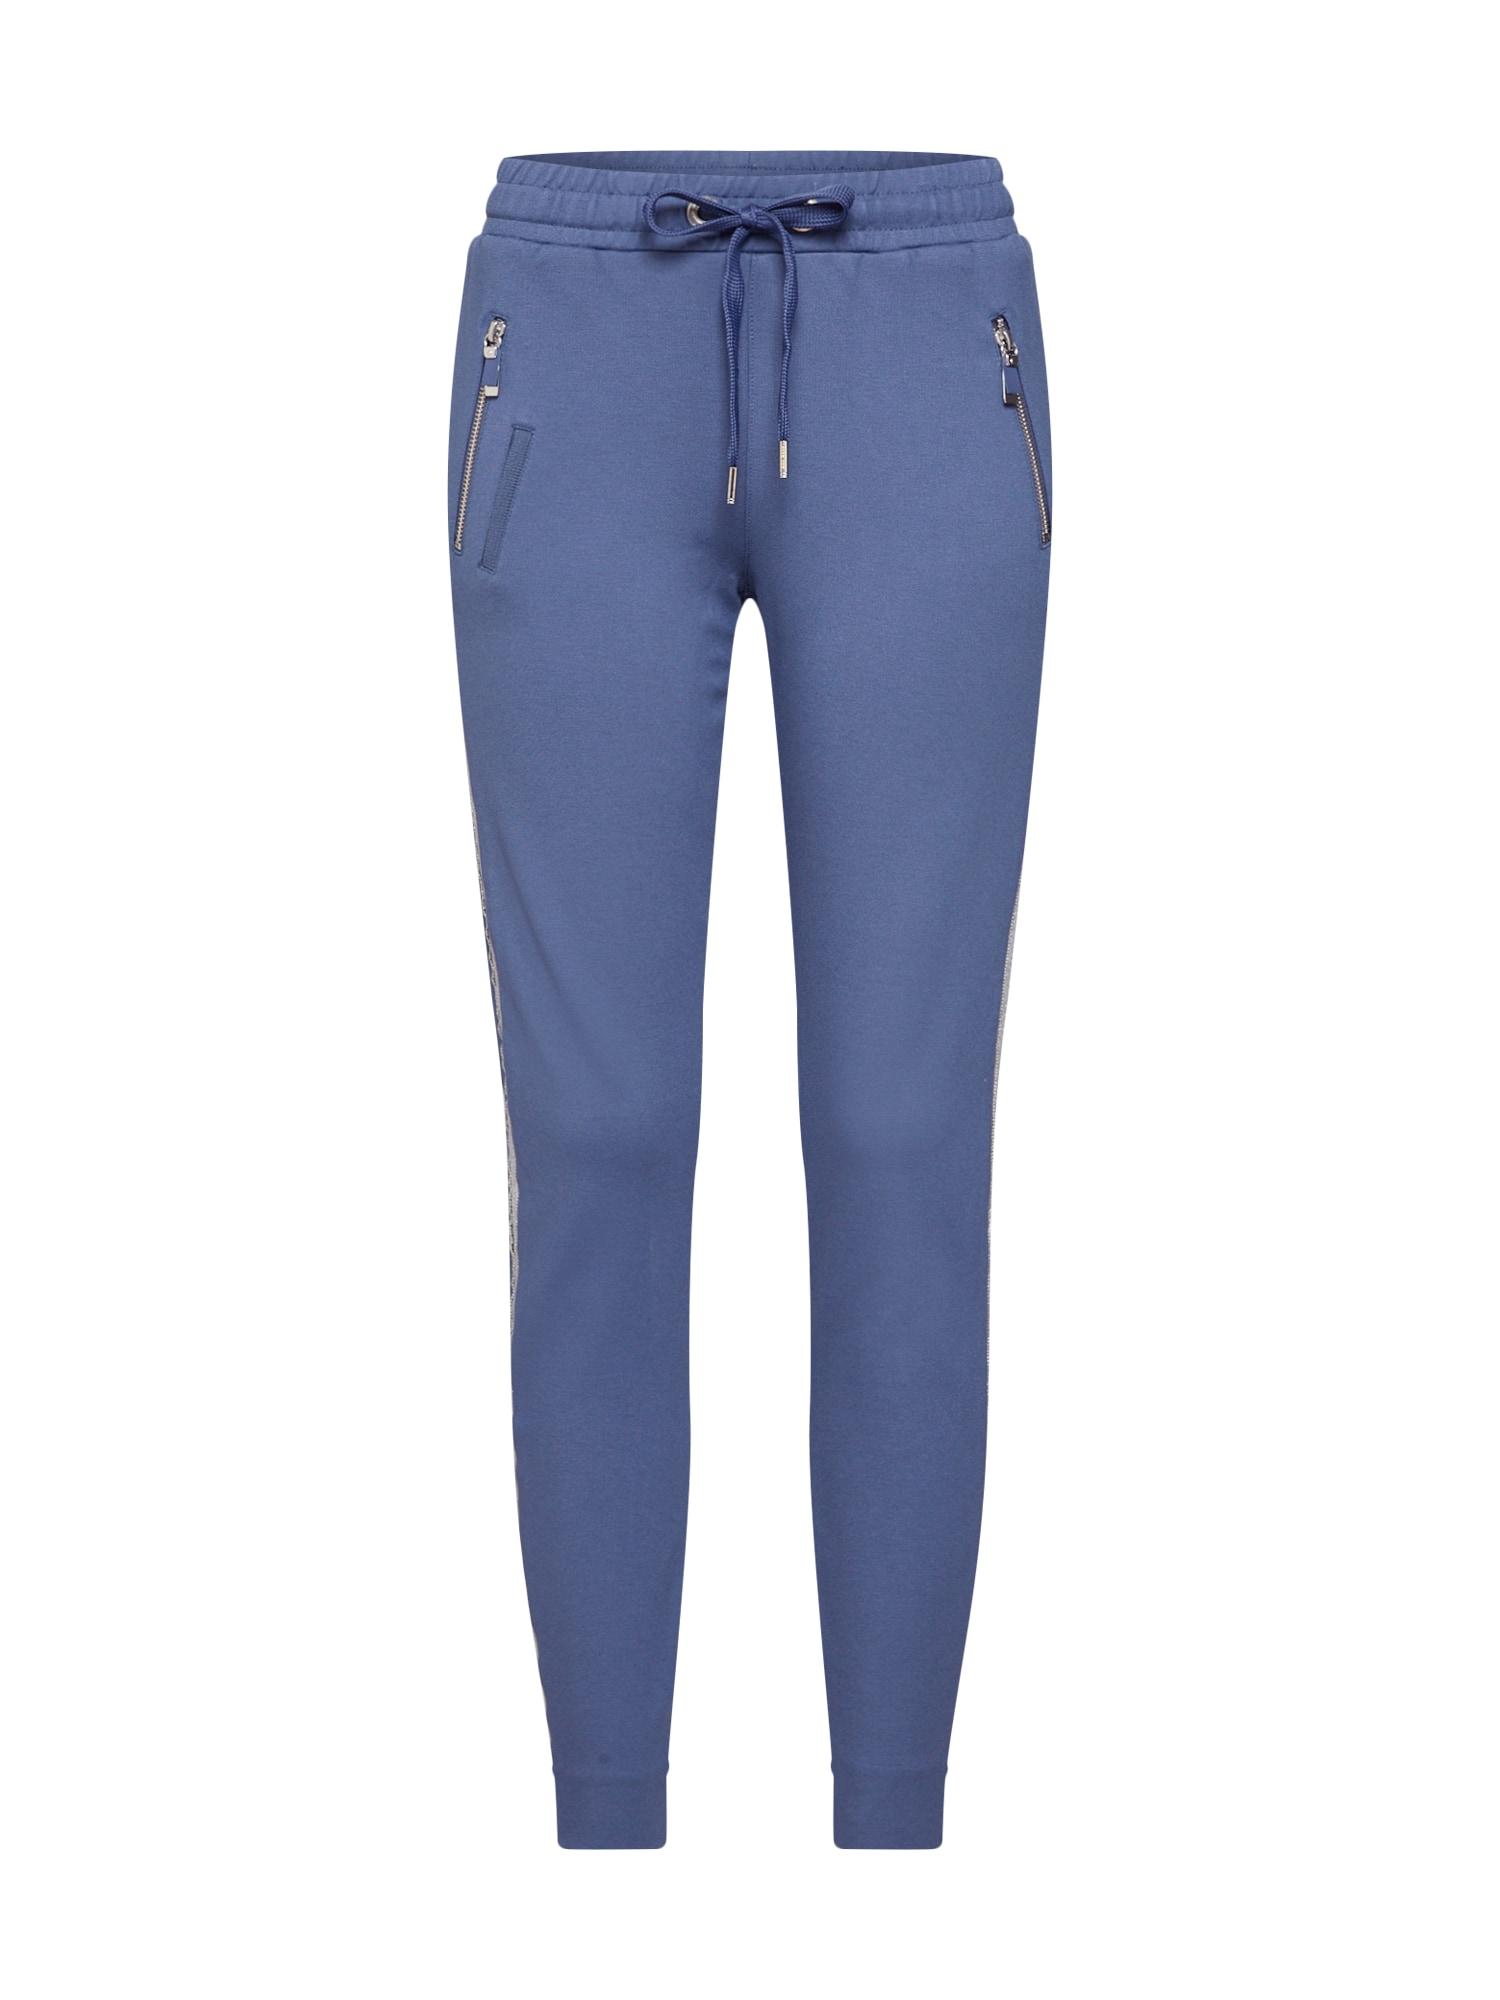 Kalhoty Levon Carell Pant indigo stříbrná MOS MOSH